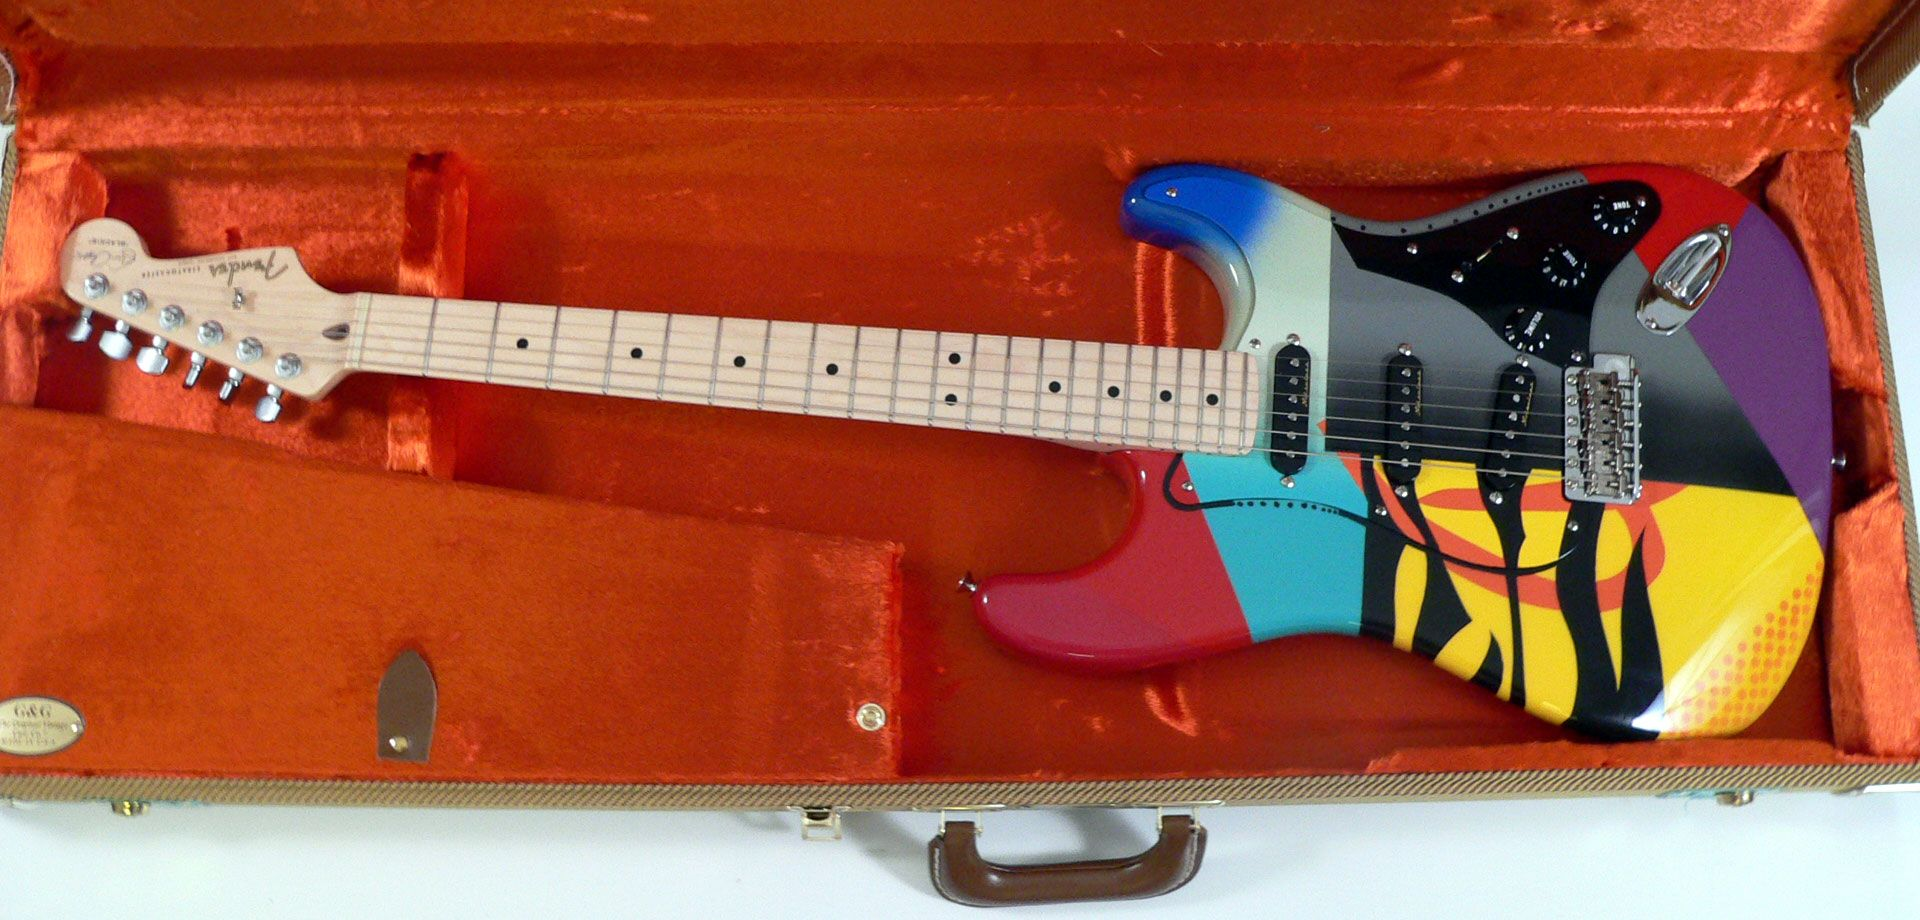 eric clapton custom fender guitars ed roman guitars crashocaster [ 1920 x 920 Pixel ]